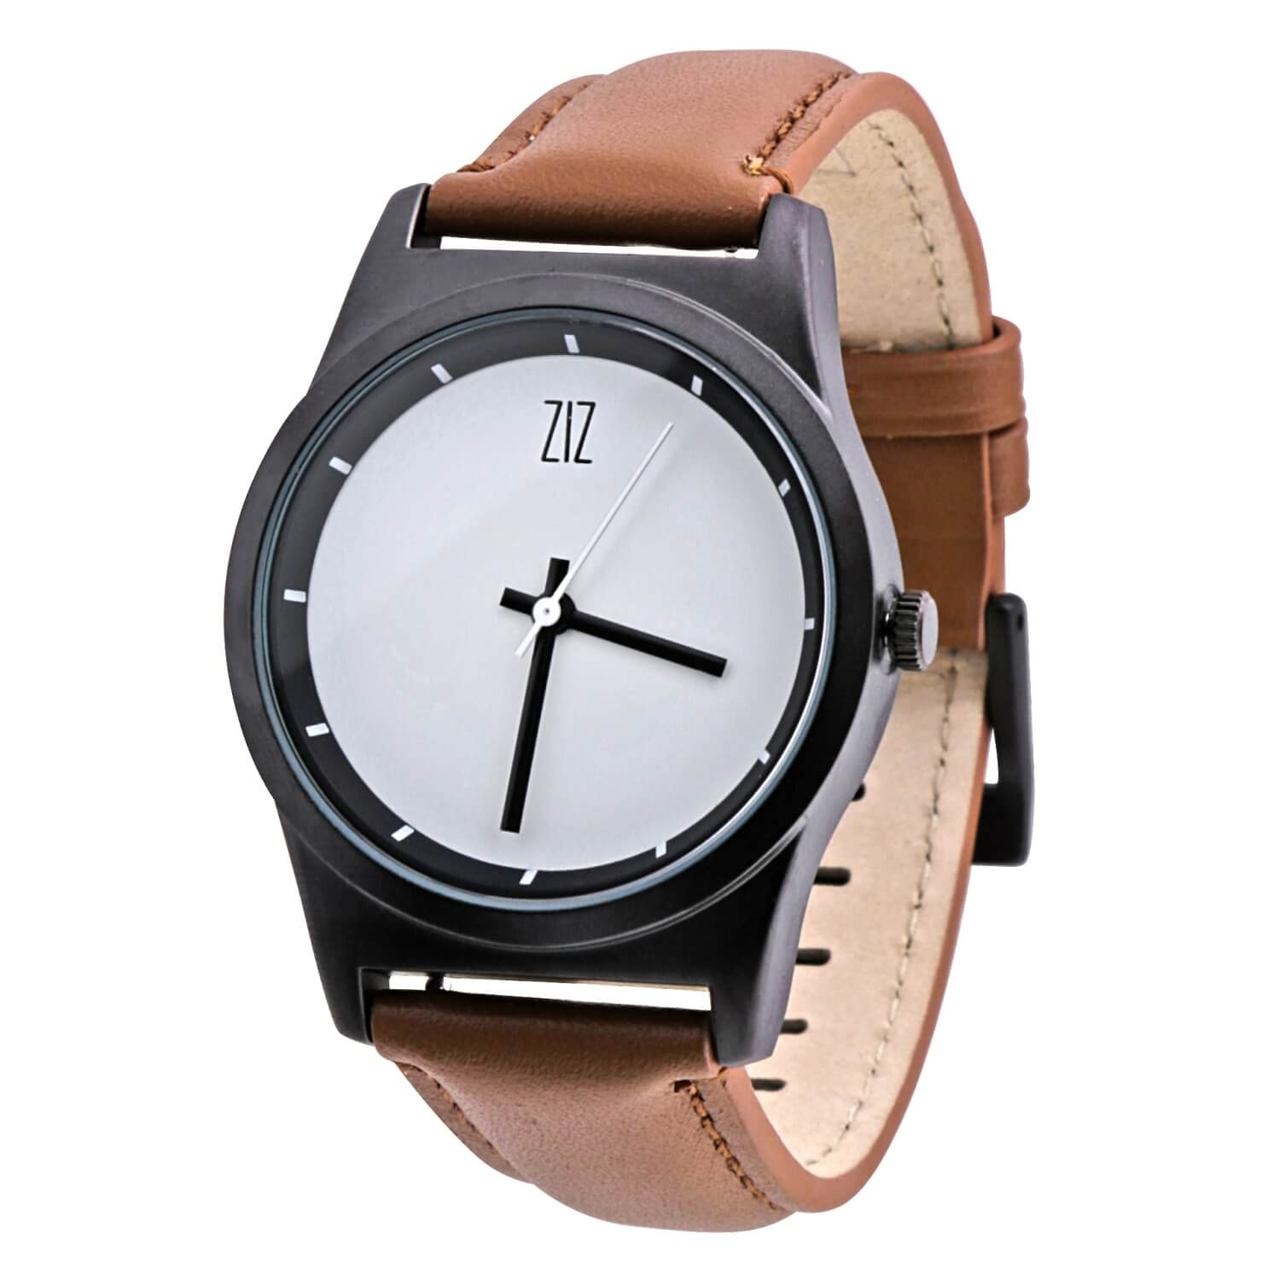 Часы ZIZ White на кожаном ремешке + доп. ремешок + подарочная коробка (4100243)